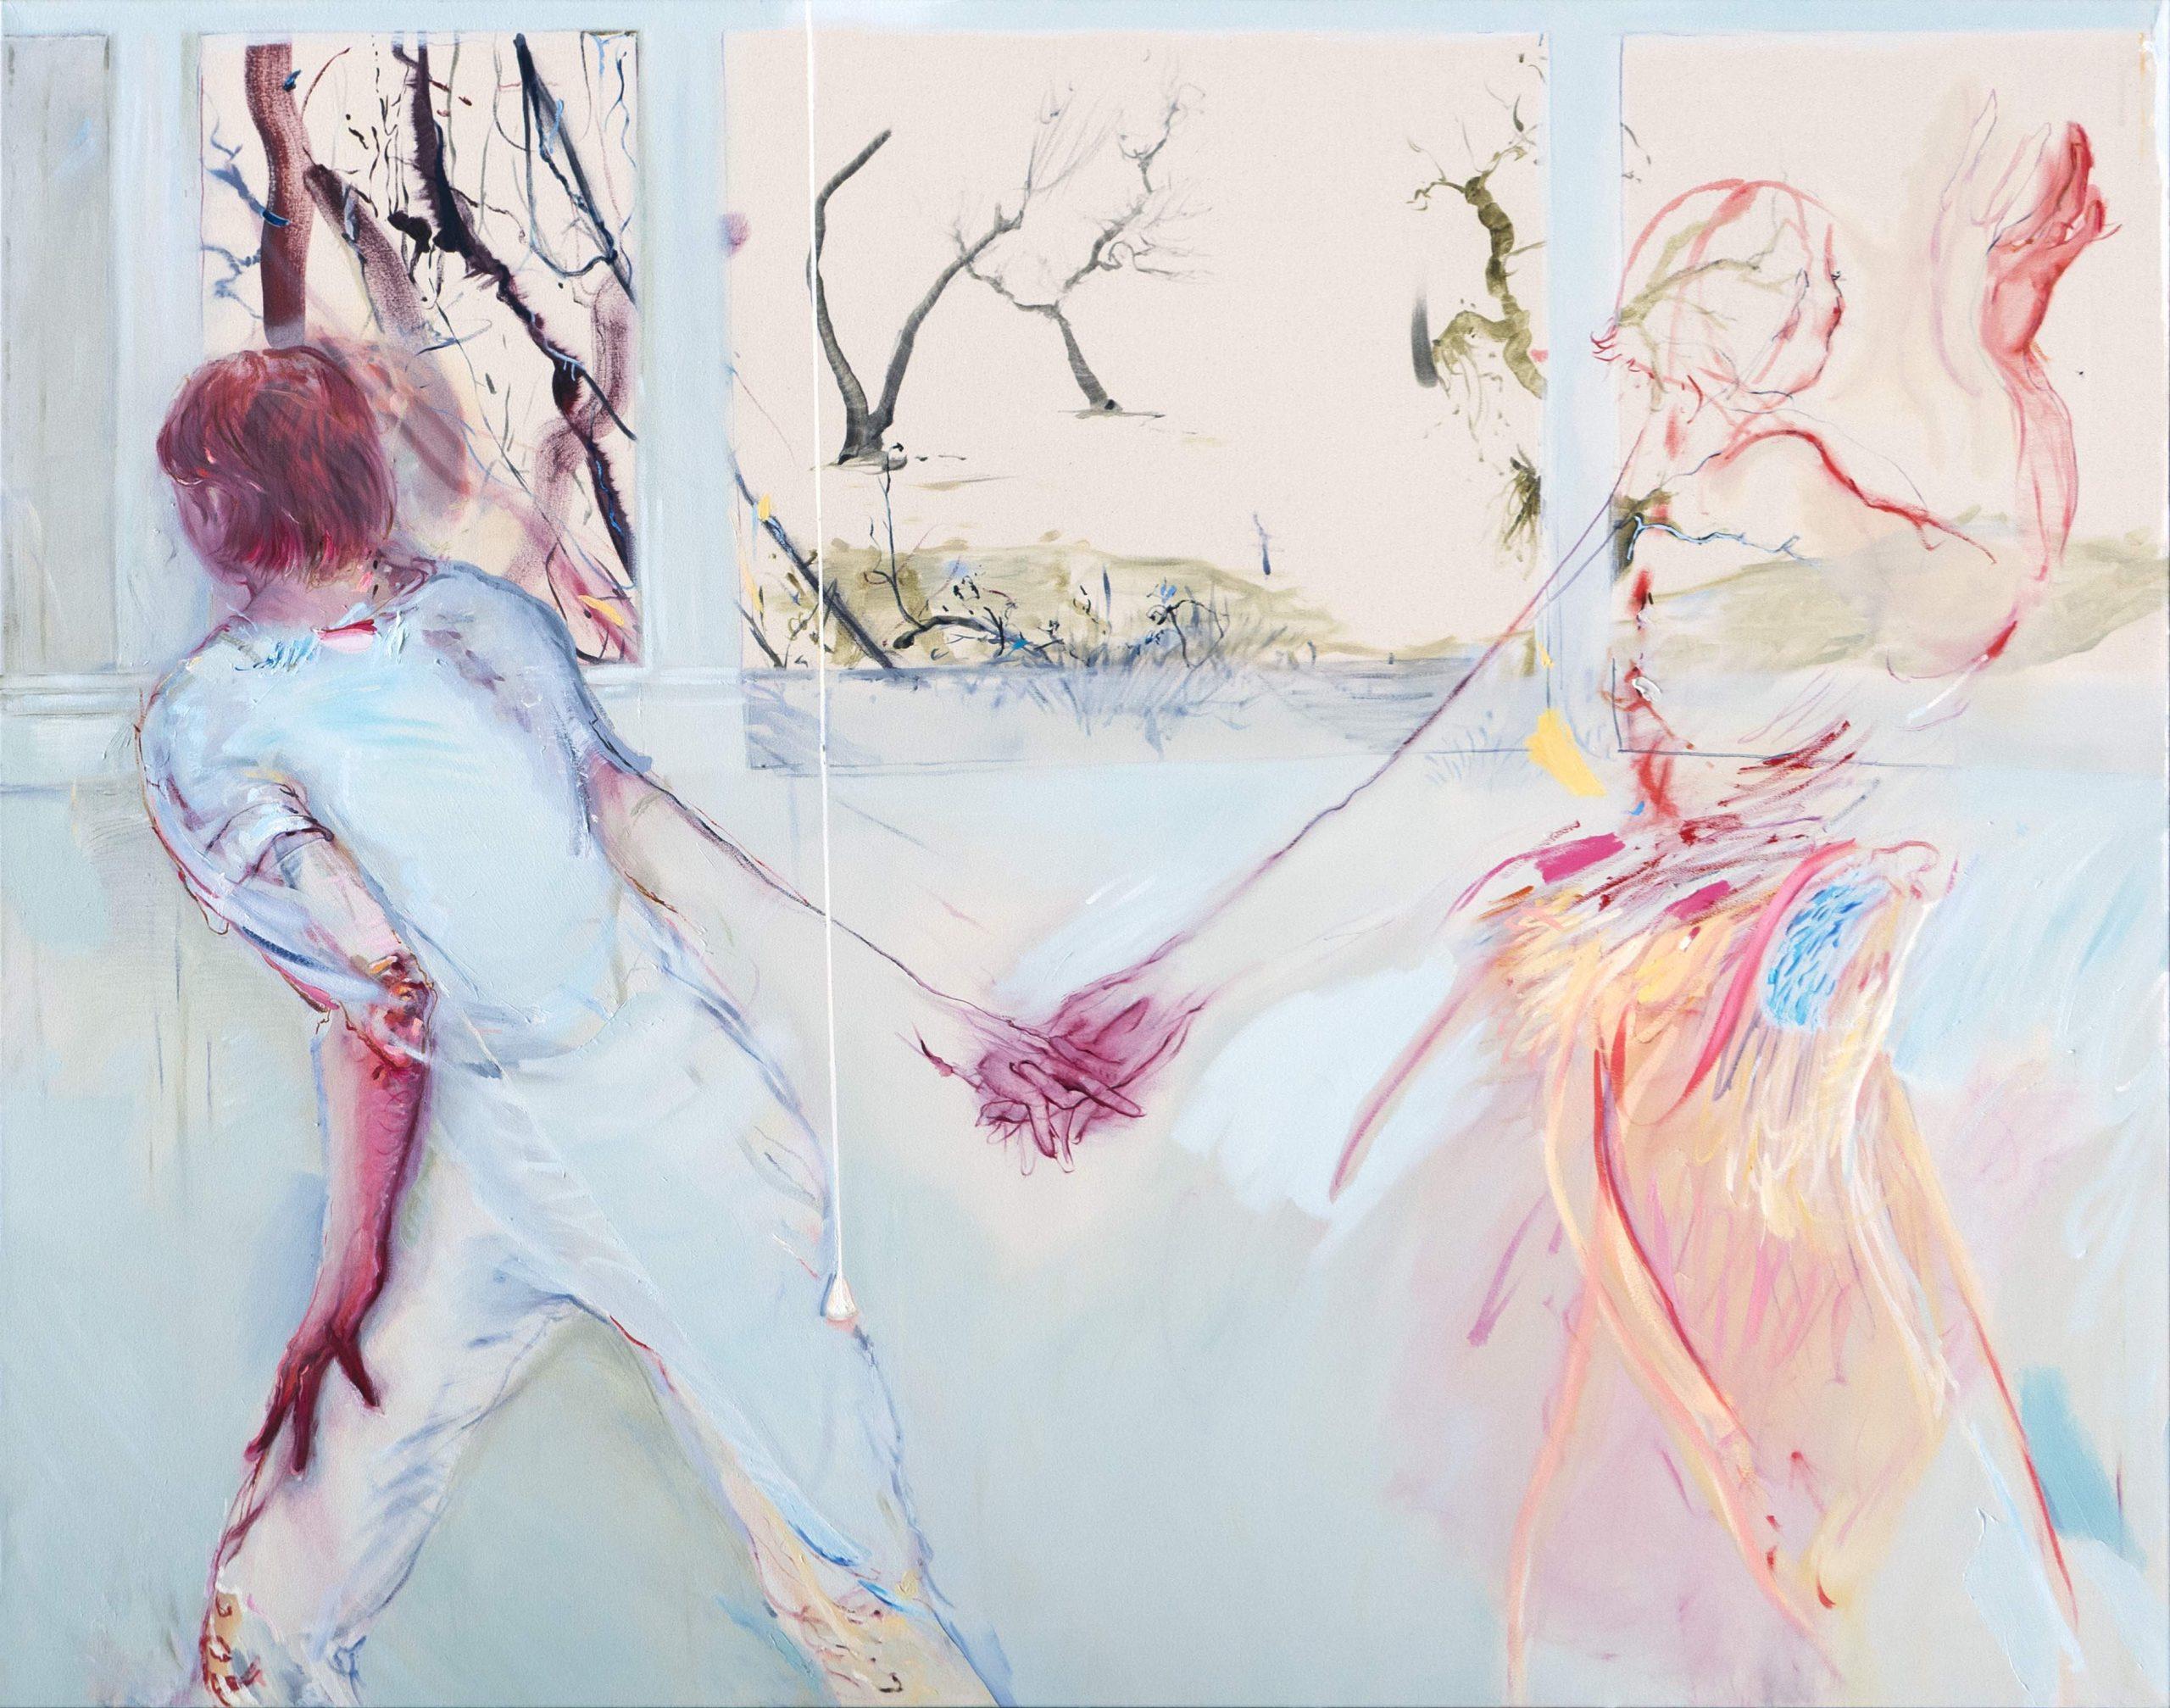 1mb Araminta Blue_Glass Tour_120 x 150 cm _oil on canvas_2020